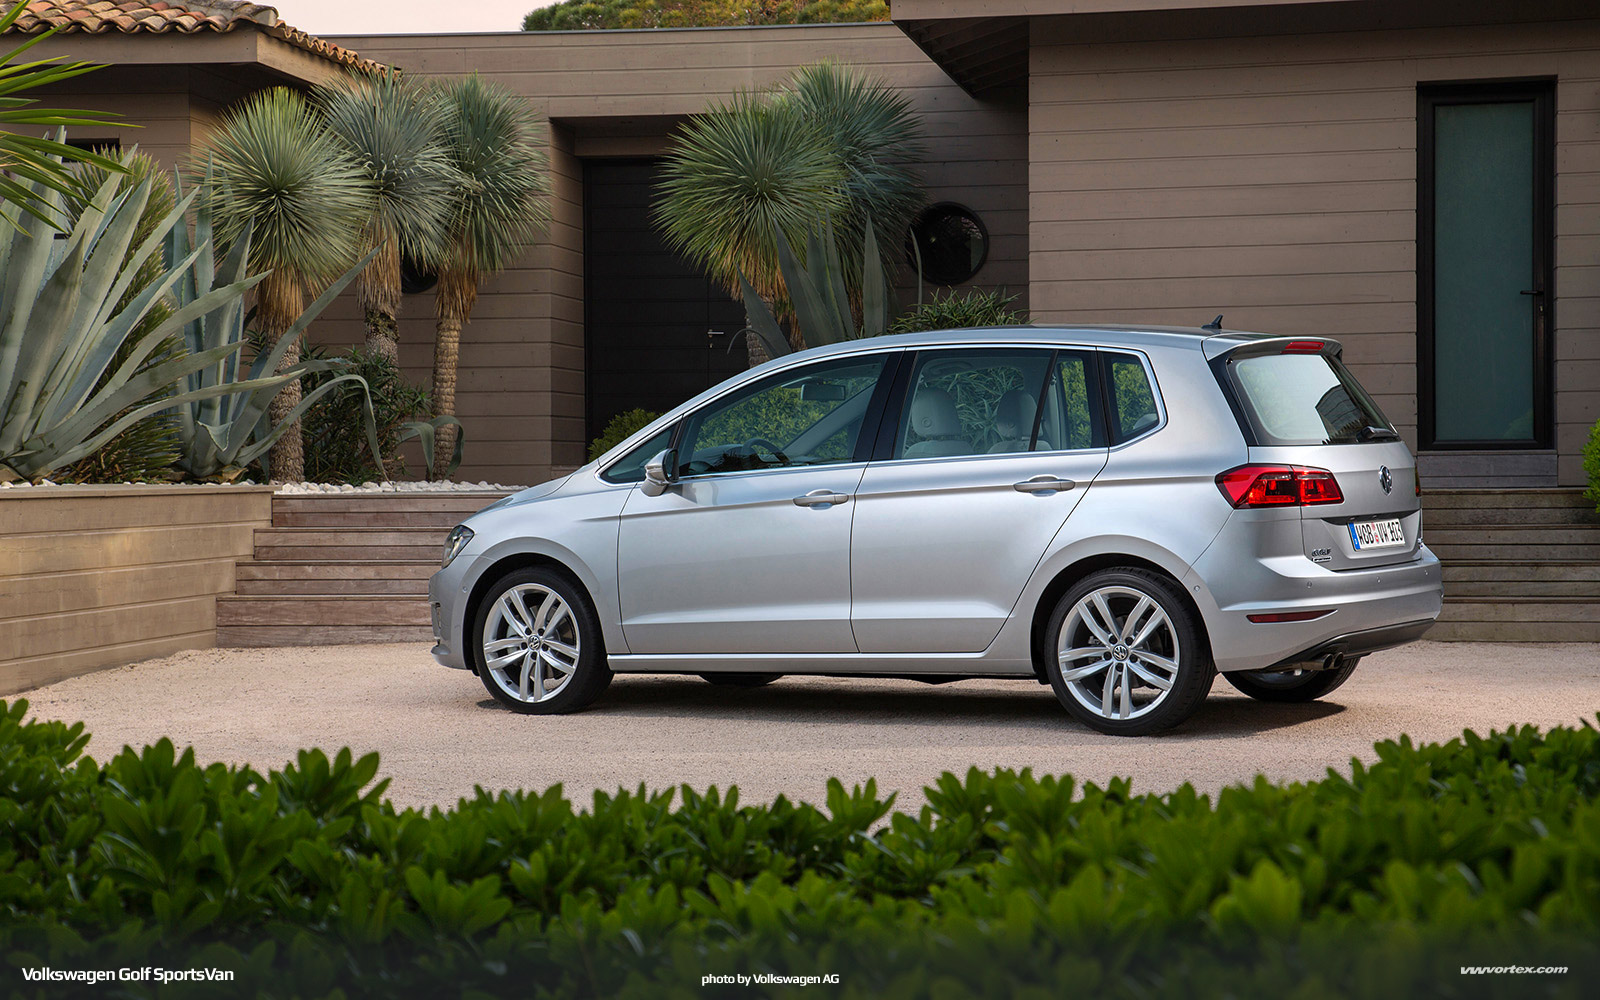 Volkswagen Golf SportsVan MQB 343 600x375